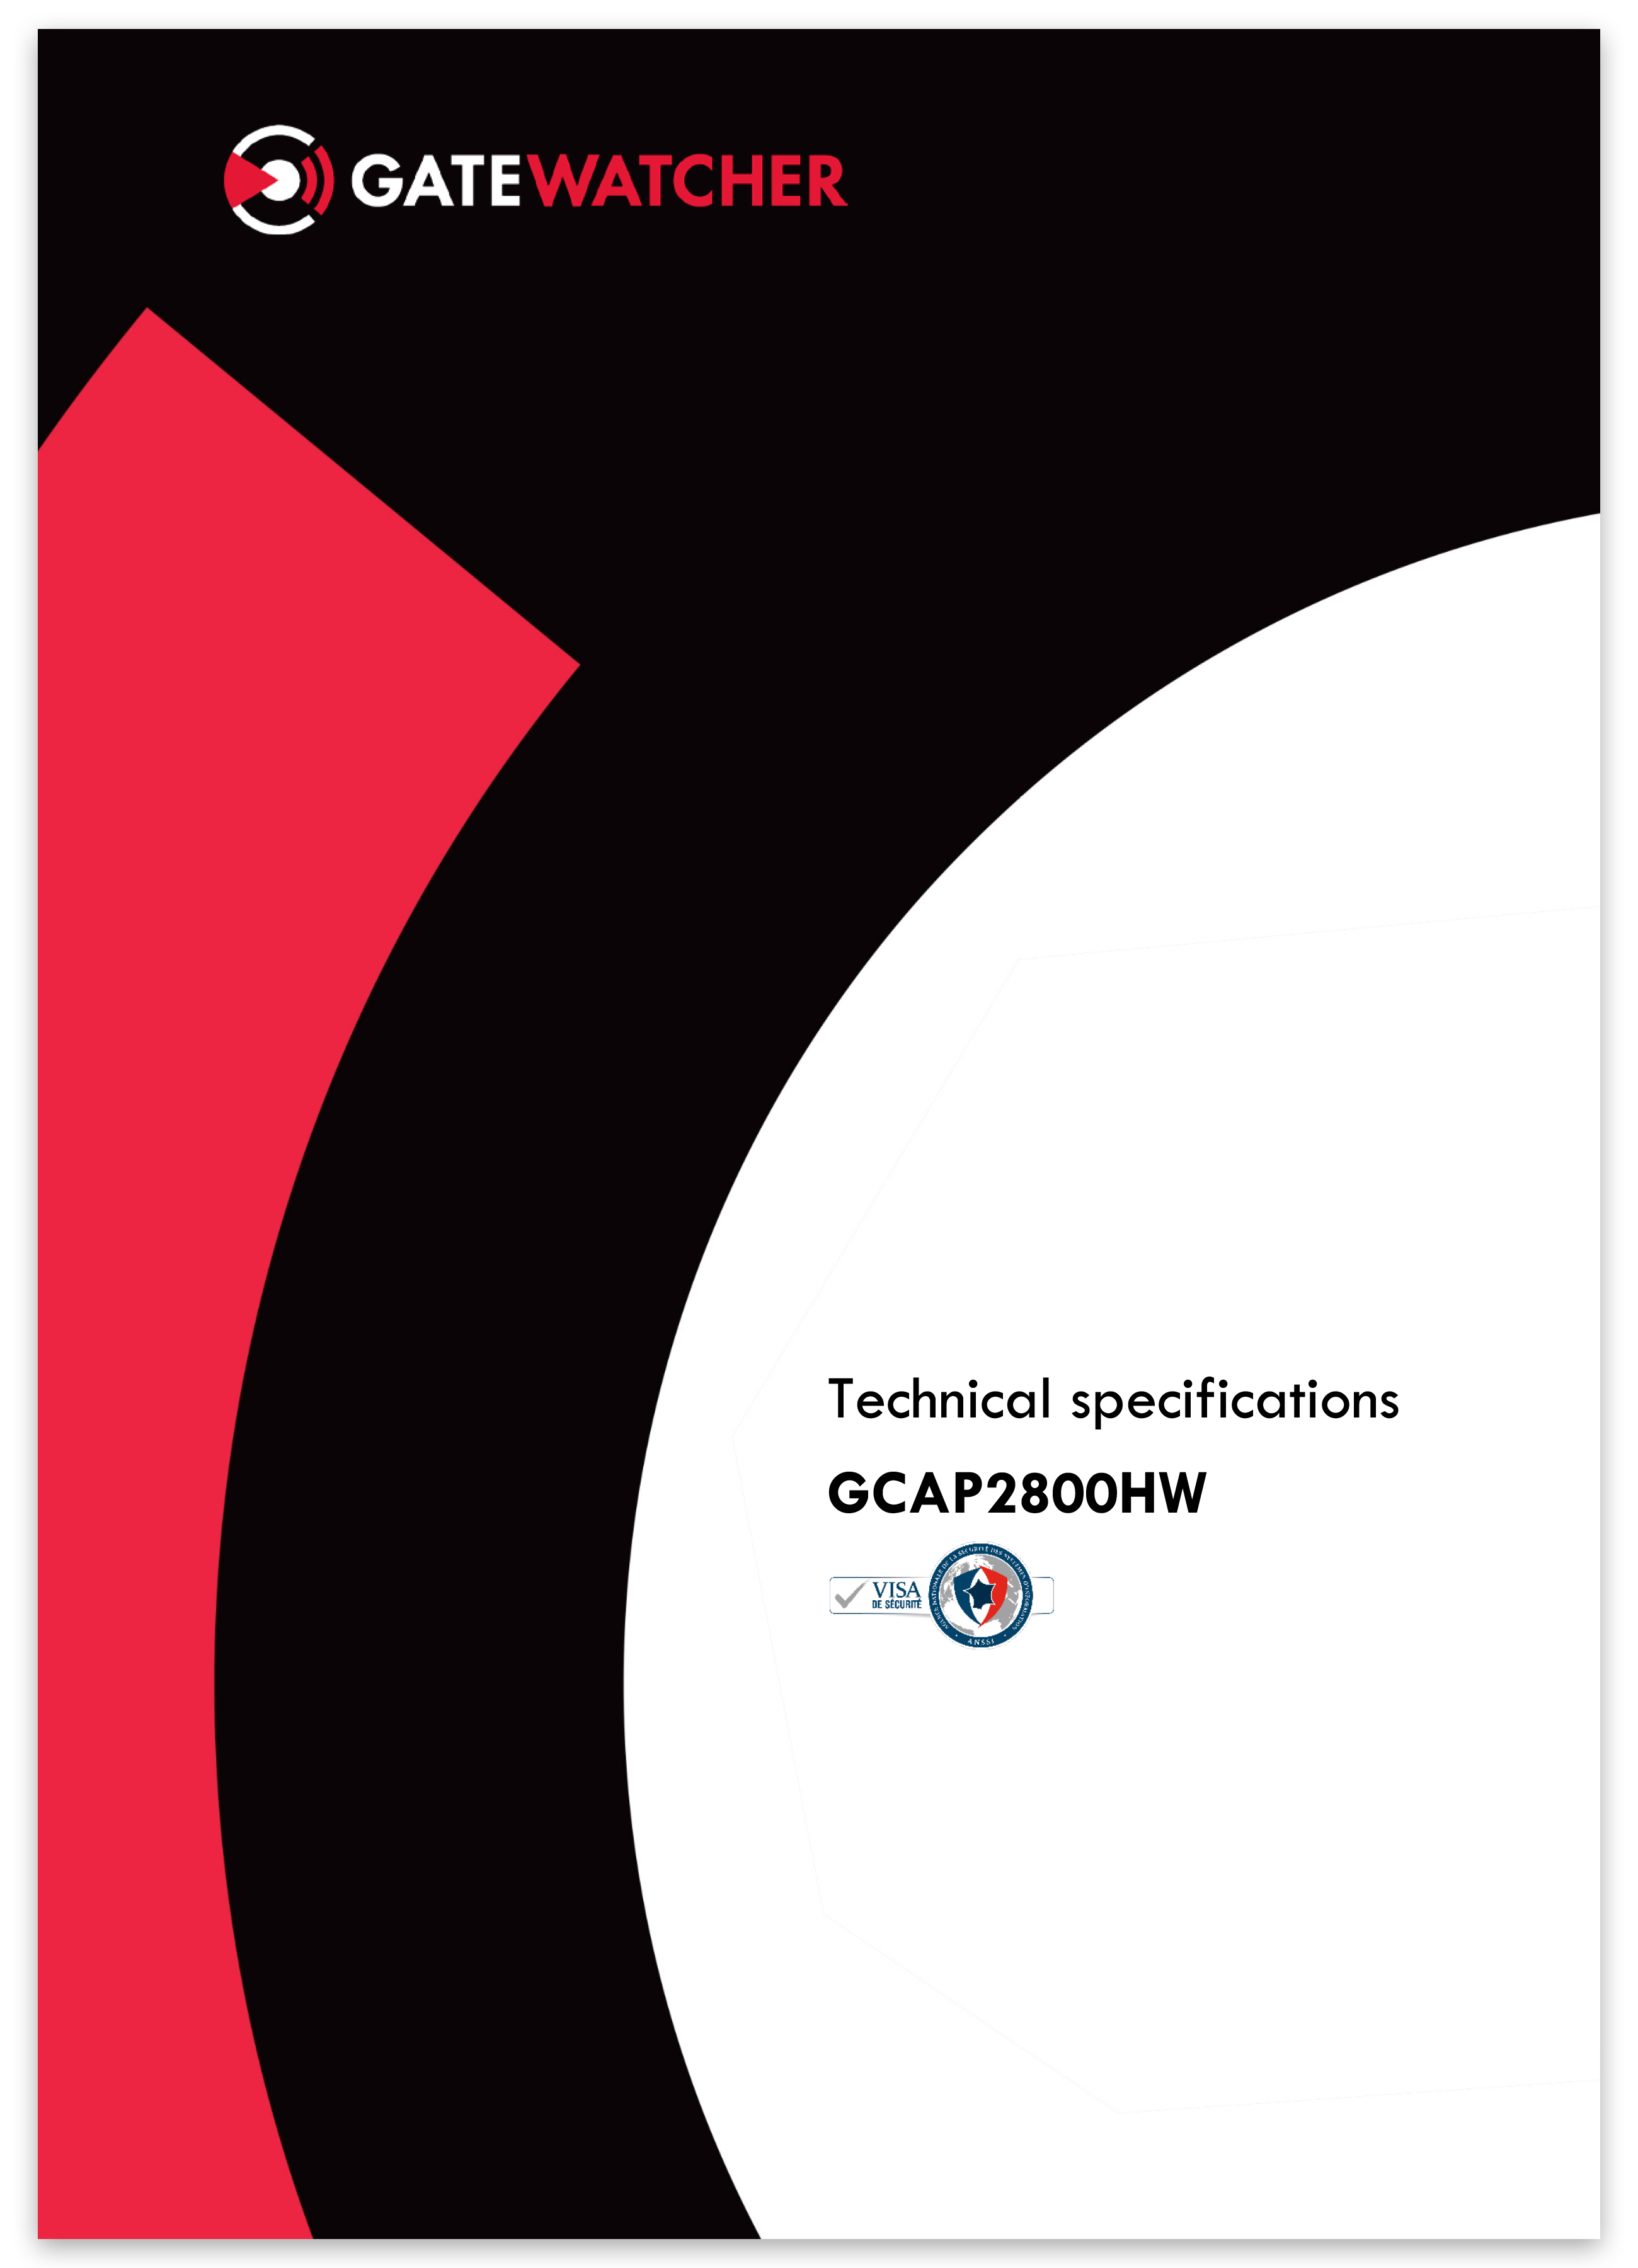 Gatewatcher GCAP2800HW EN